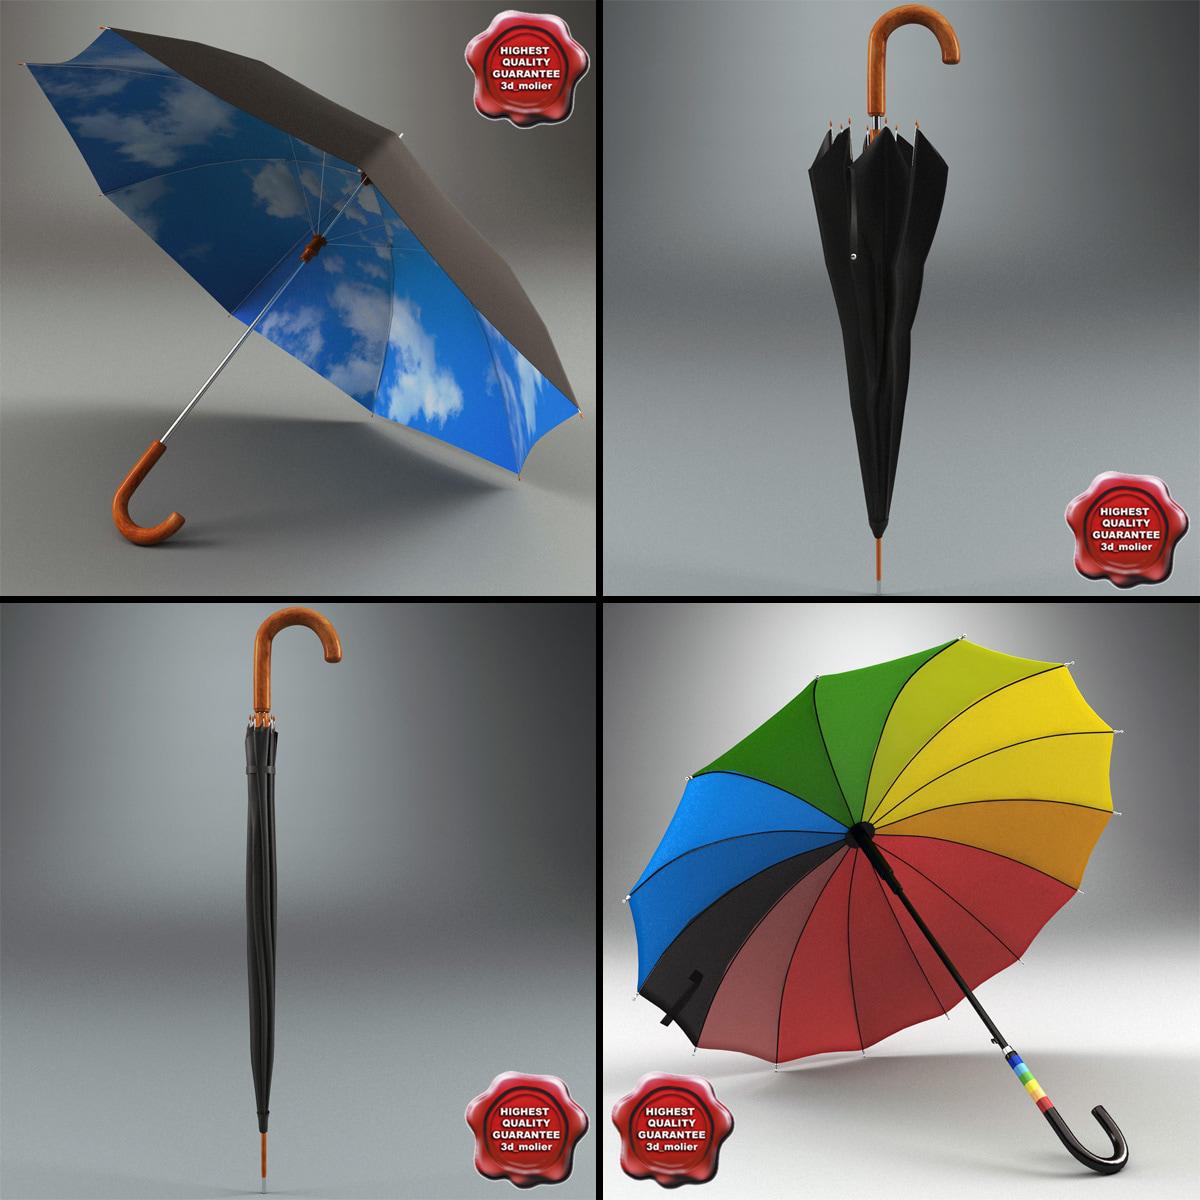 maya umbrellas set modelled